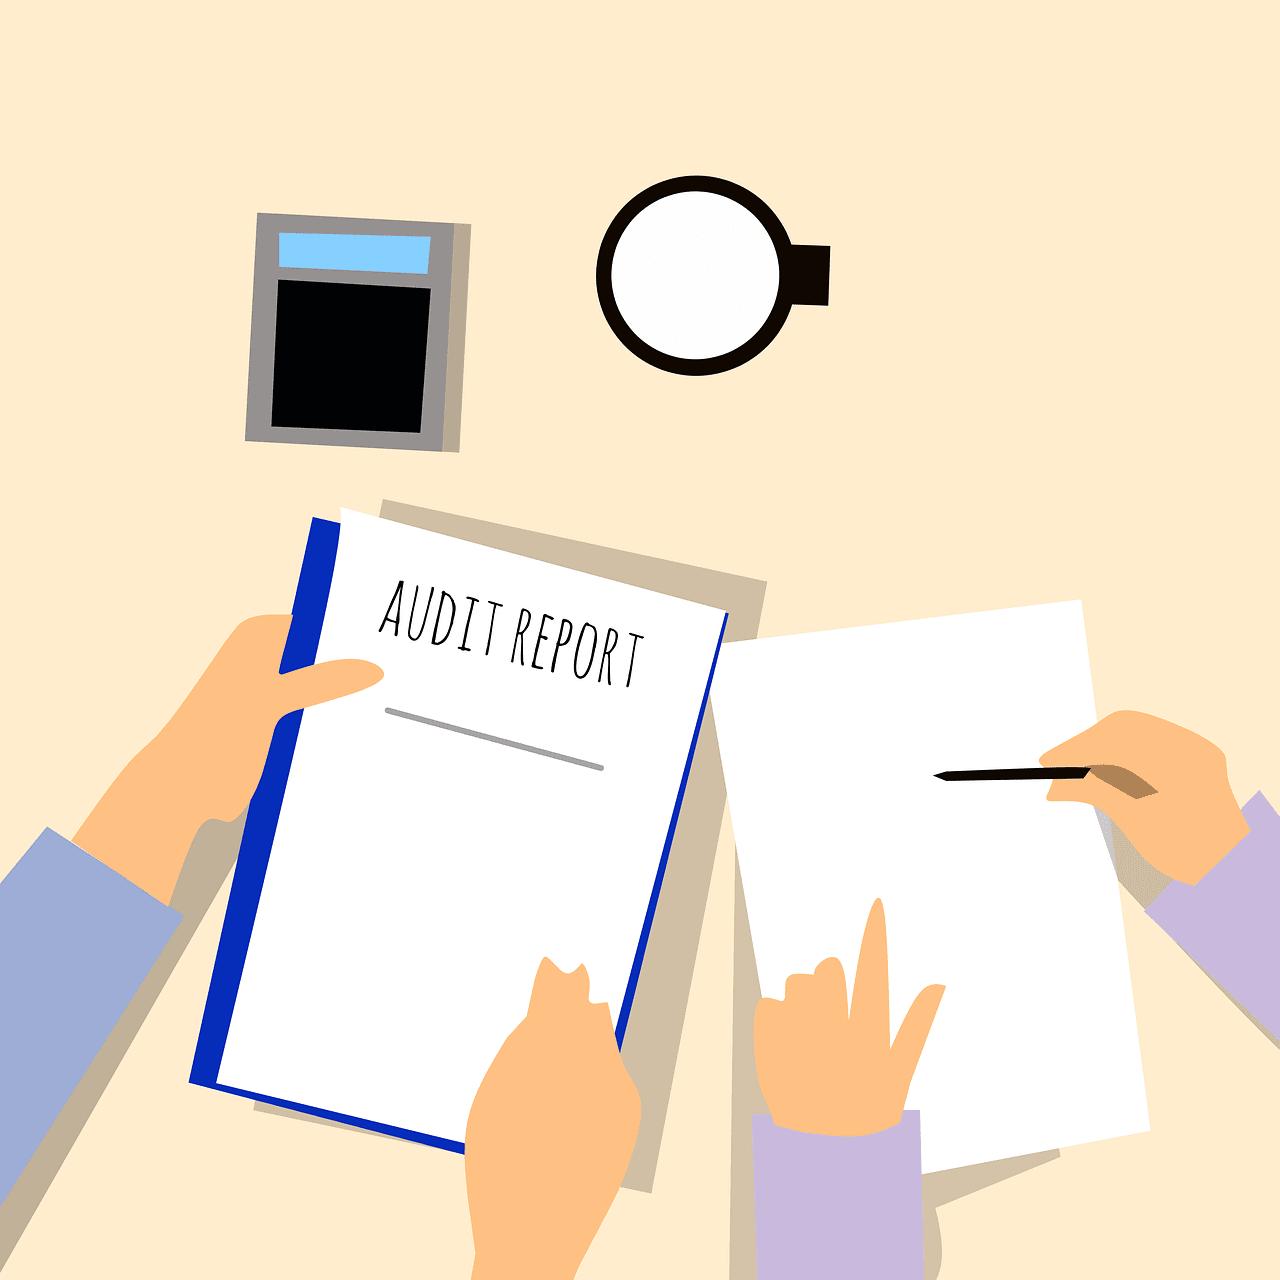 Contoh Application Letter Untuk Staff Auditor (Fresh Graduate)